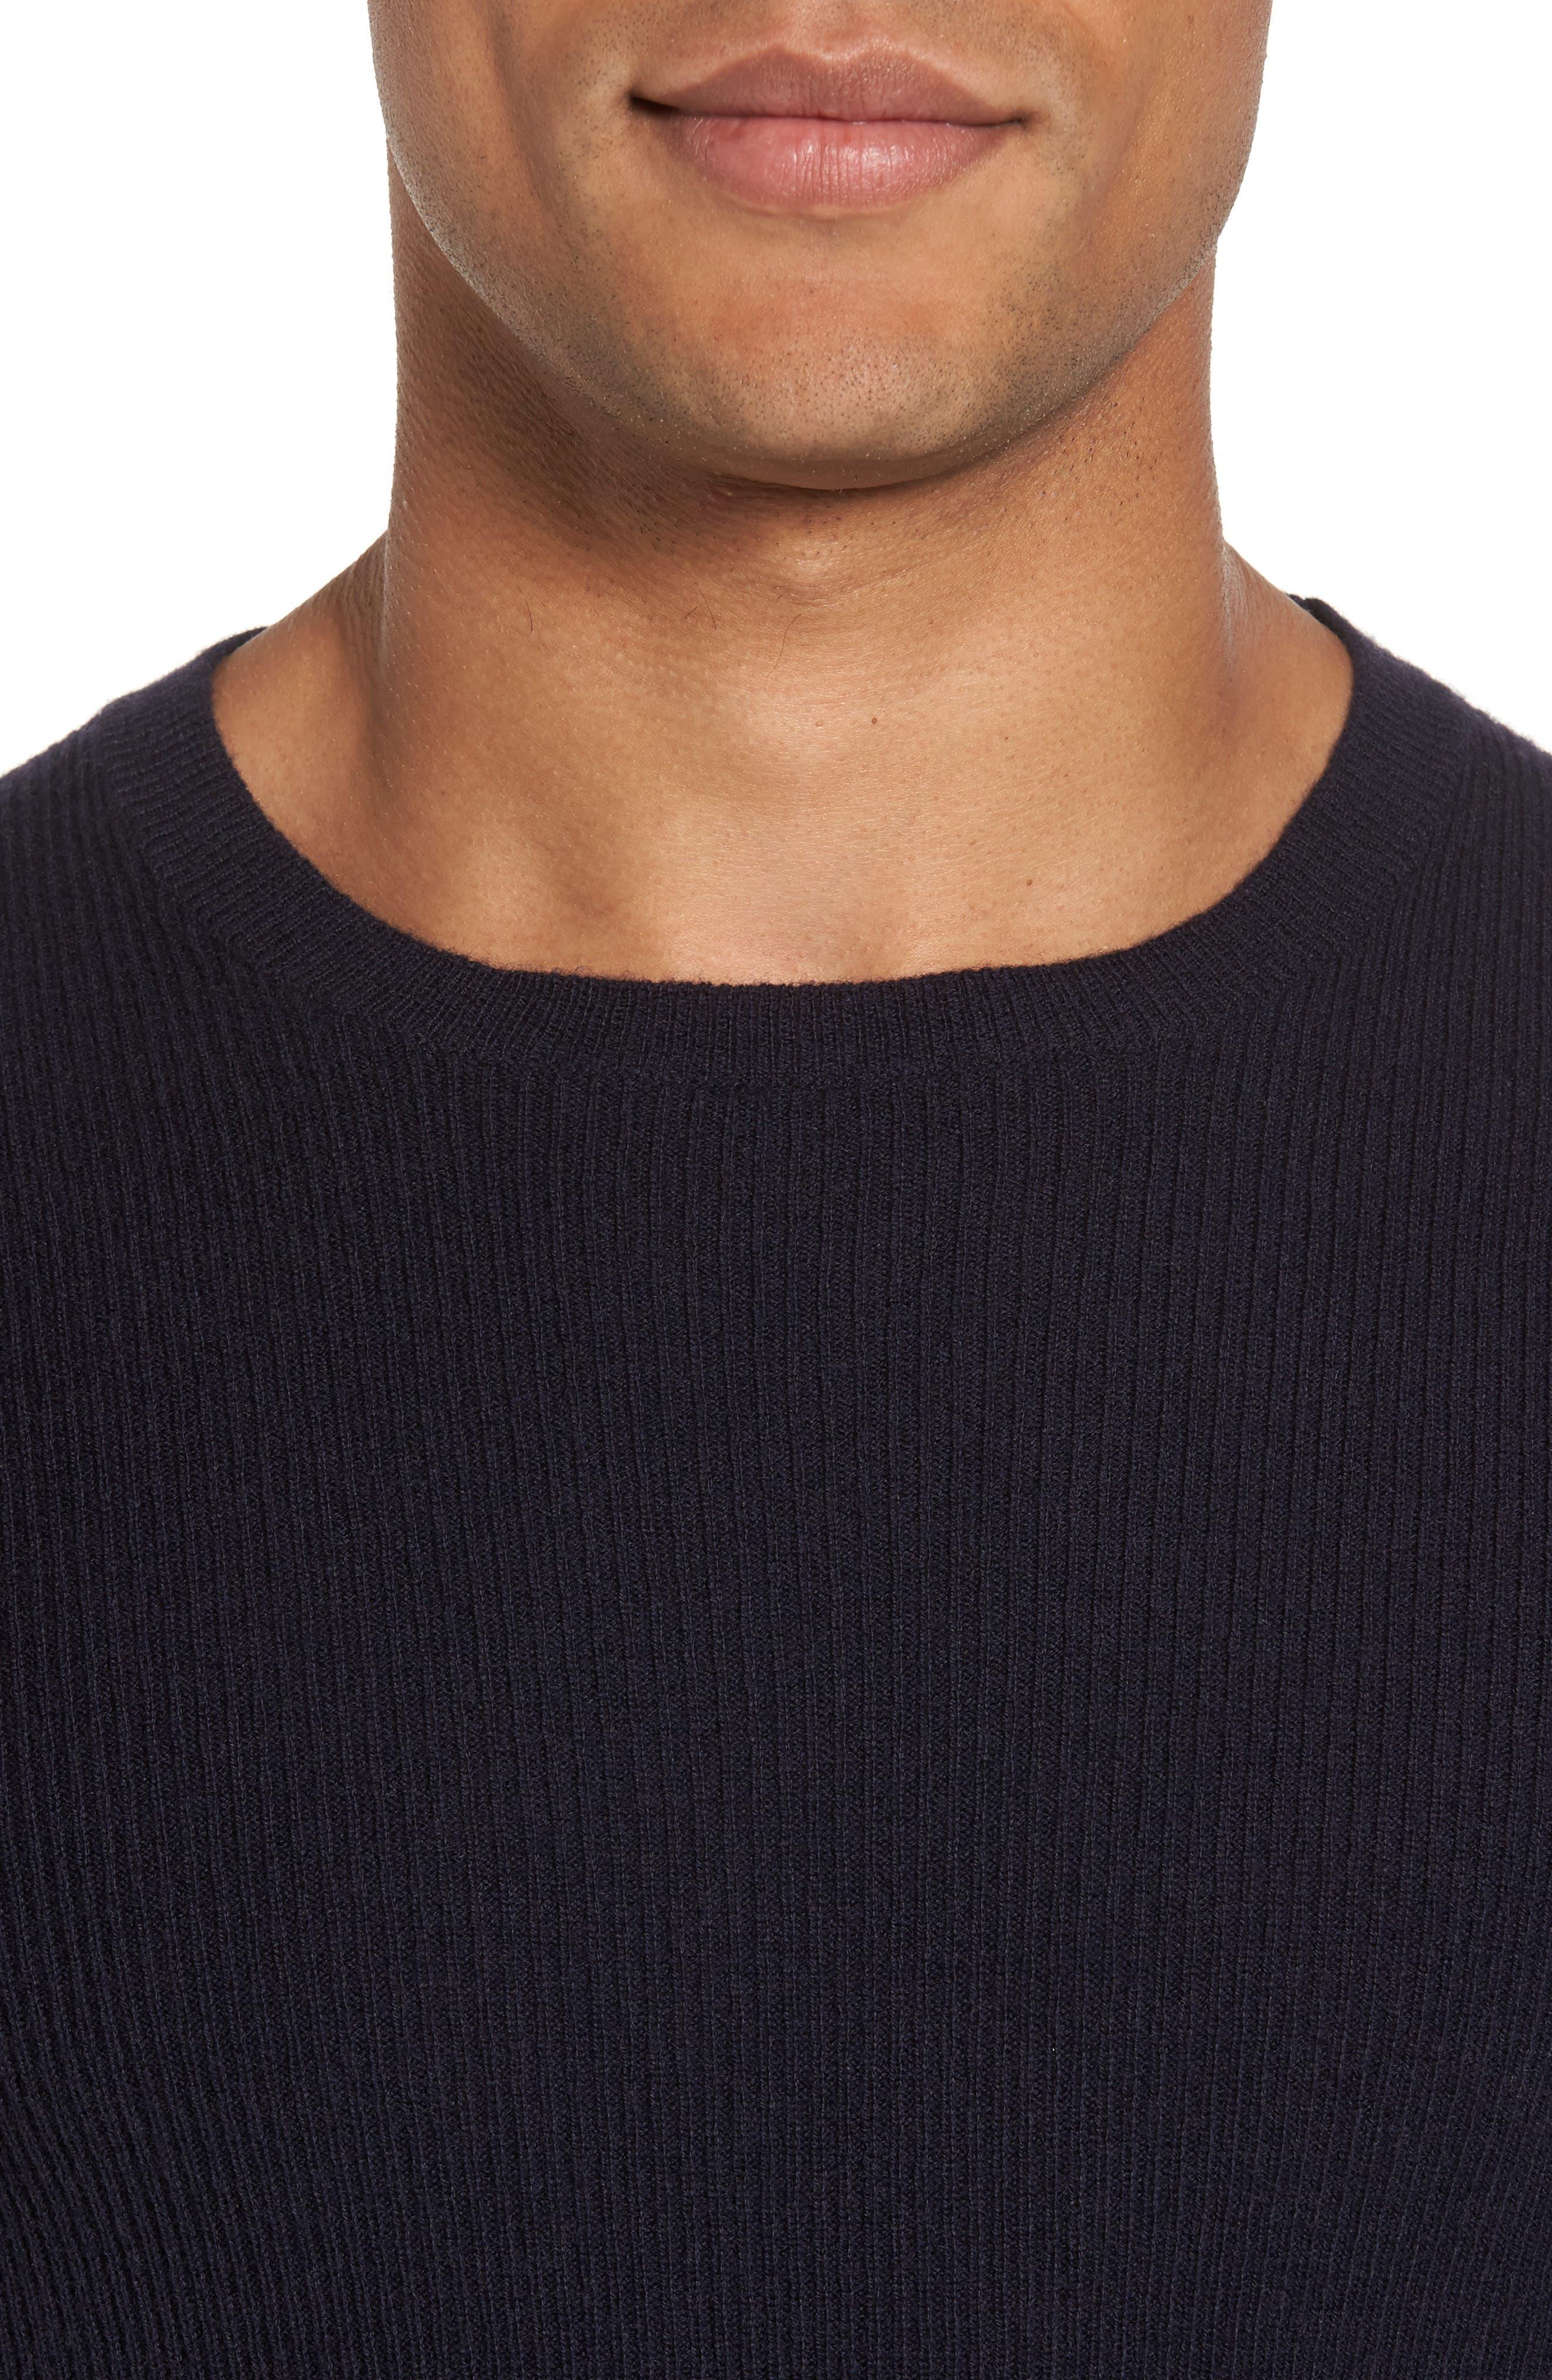 Colorblock Crewneck Sweater,                             Alternate thumbnail 4, color,                             410